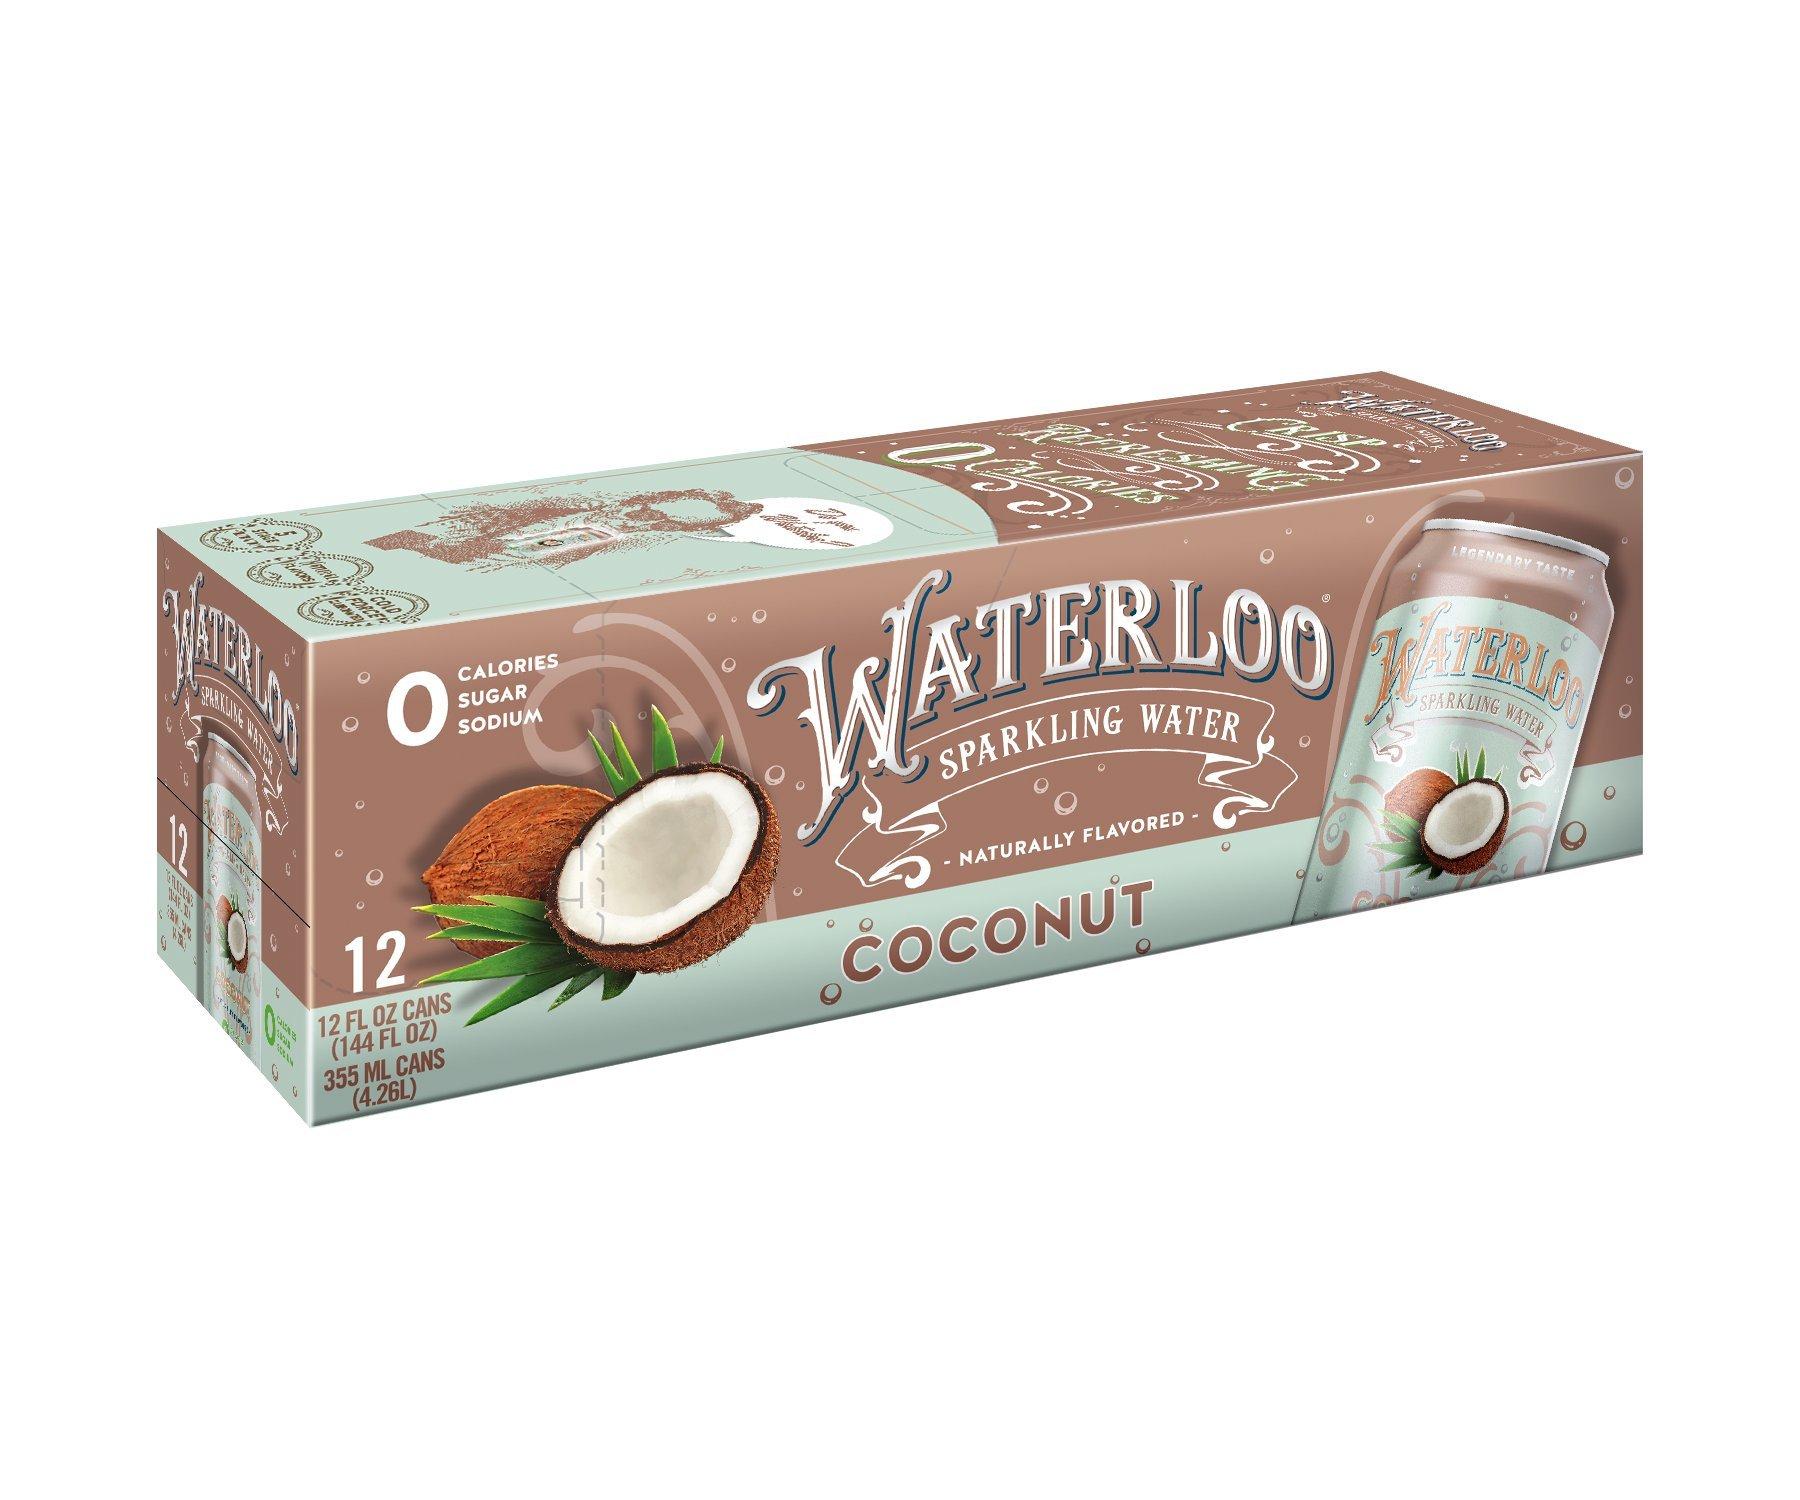 Amazon Waterloo Sparkling Water Black Cherry Fruit Flavor Zero